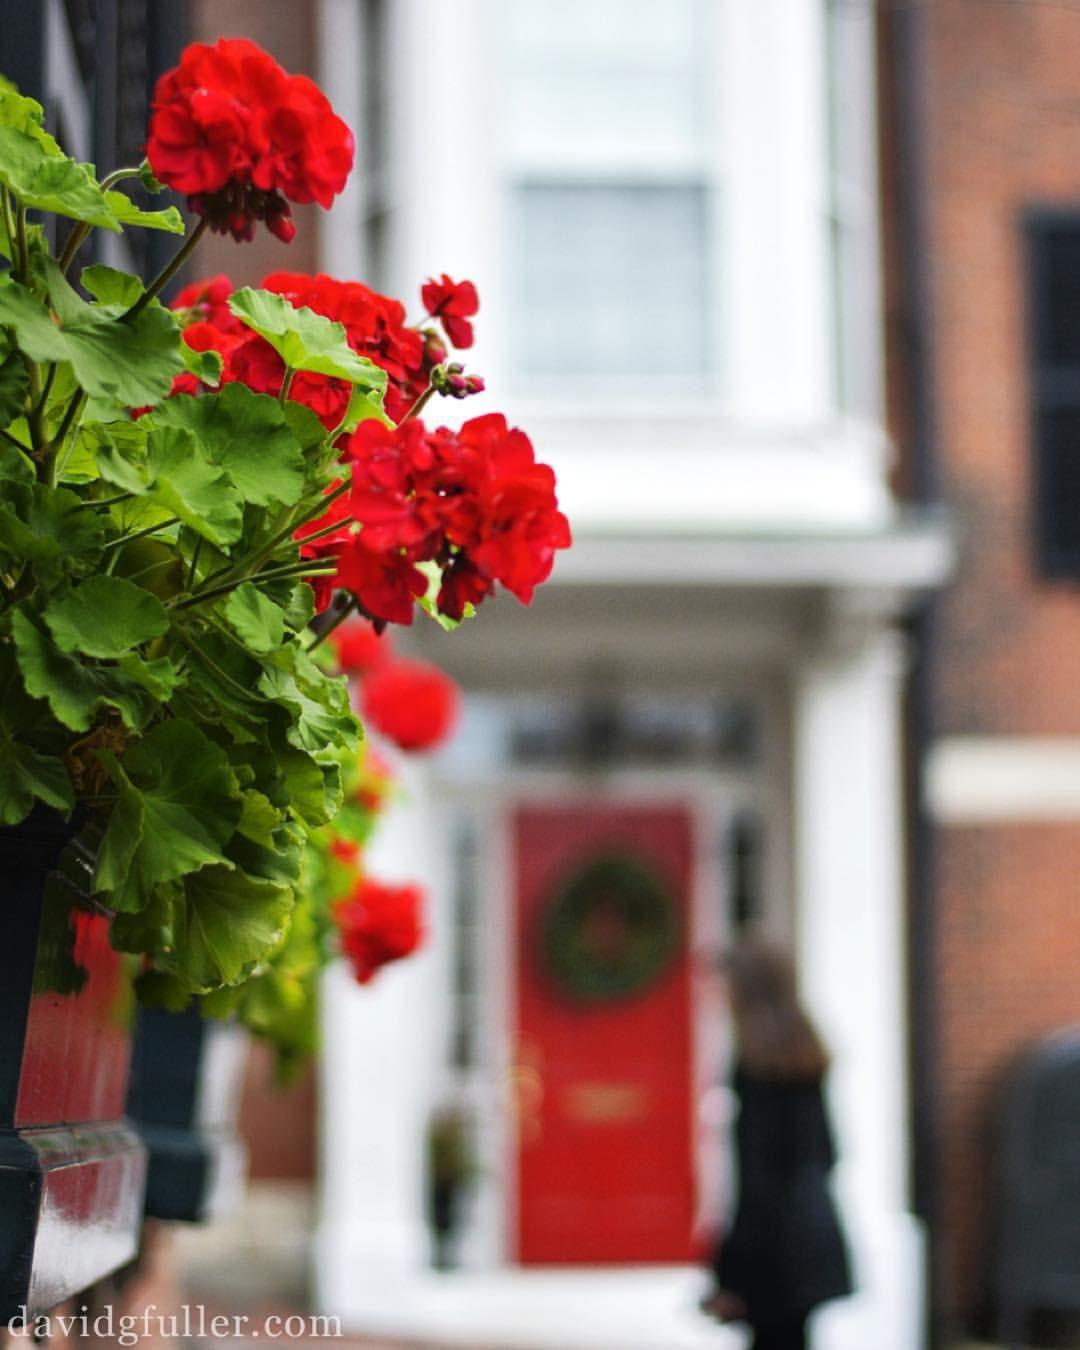 Nothing says Christmas like geraniums in bloom | Geraniums/Geranios ...